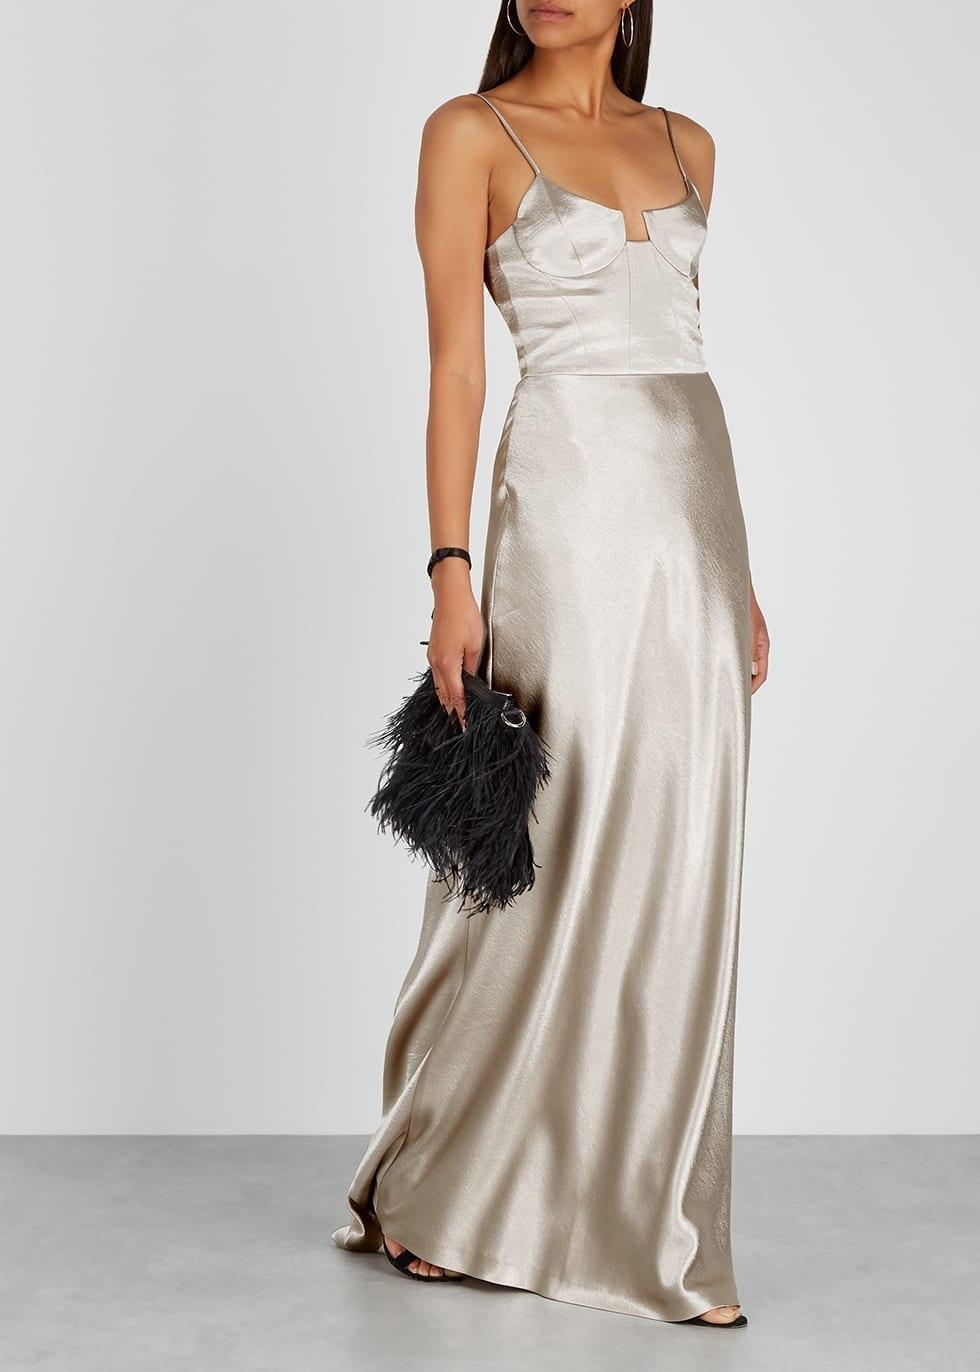 GALVAN Phoebe Champagne Satin Gown